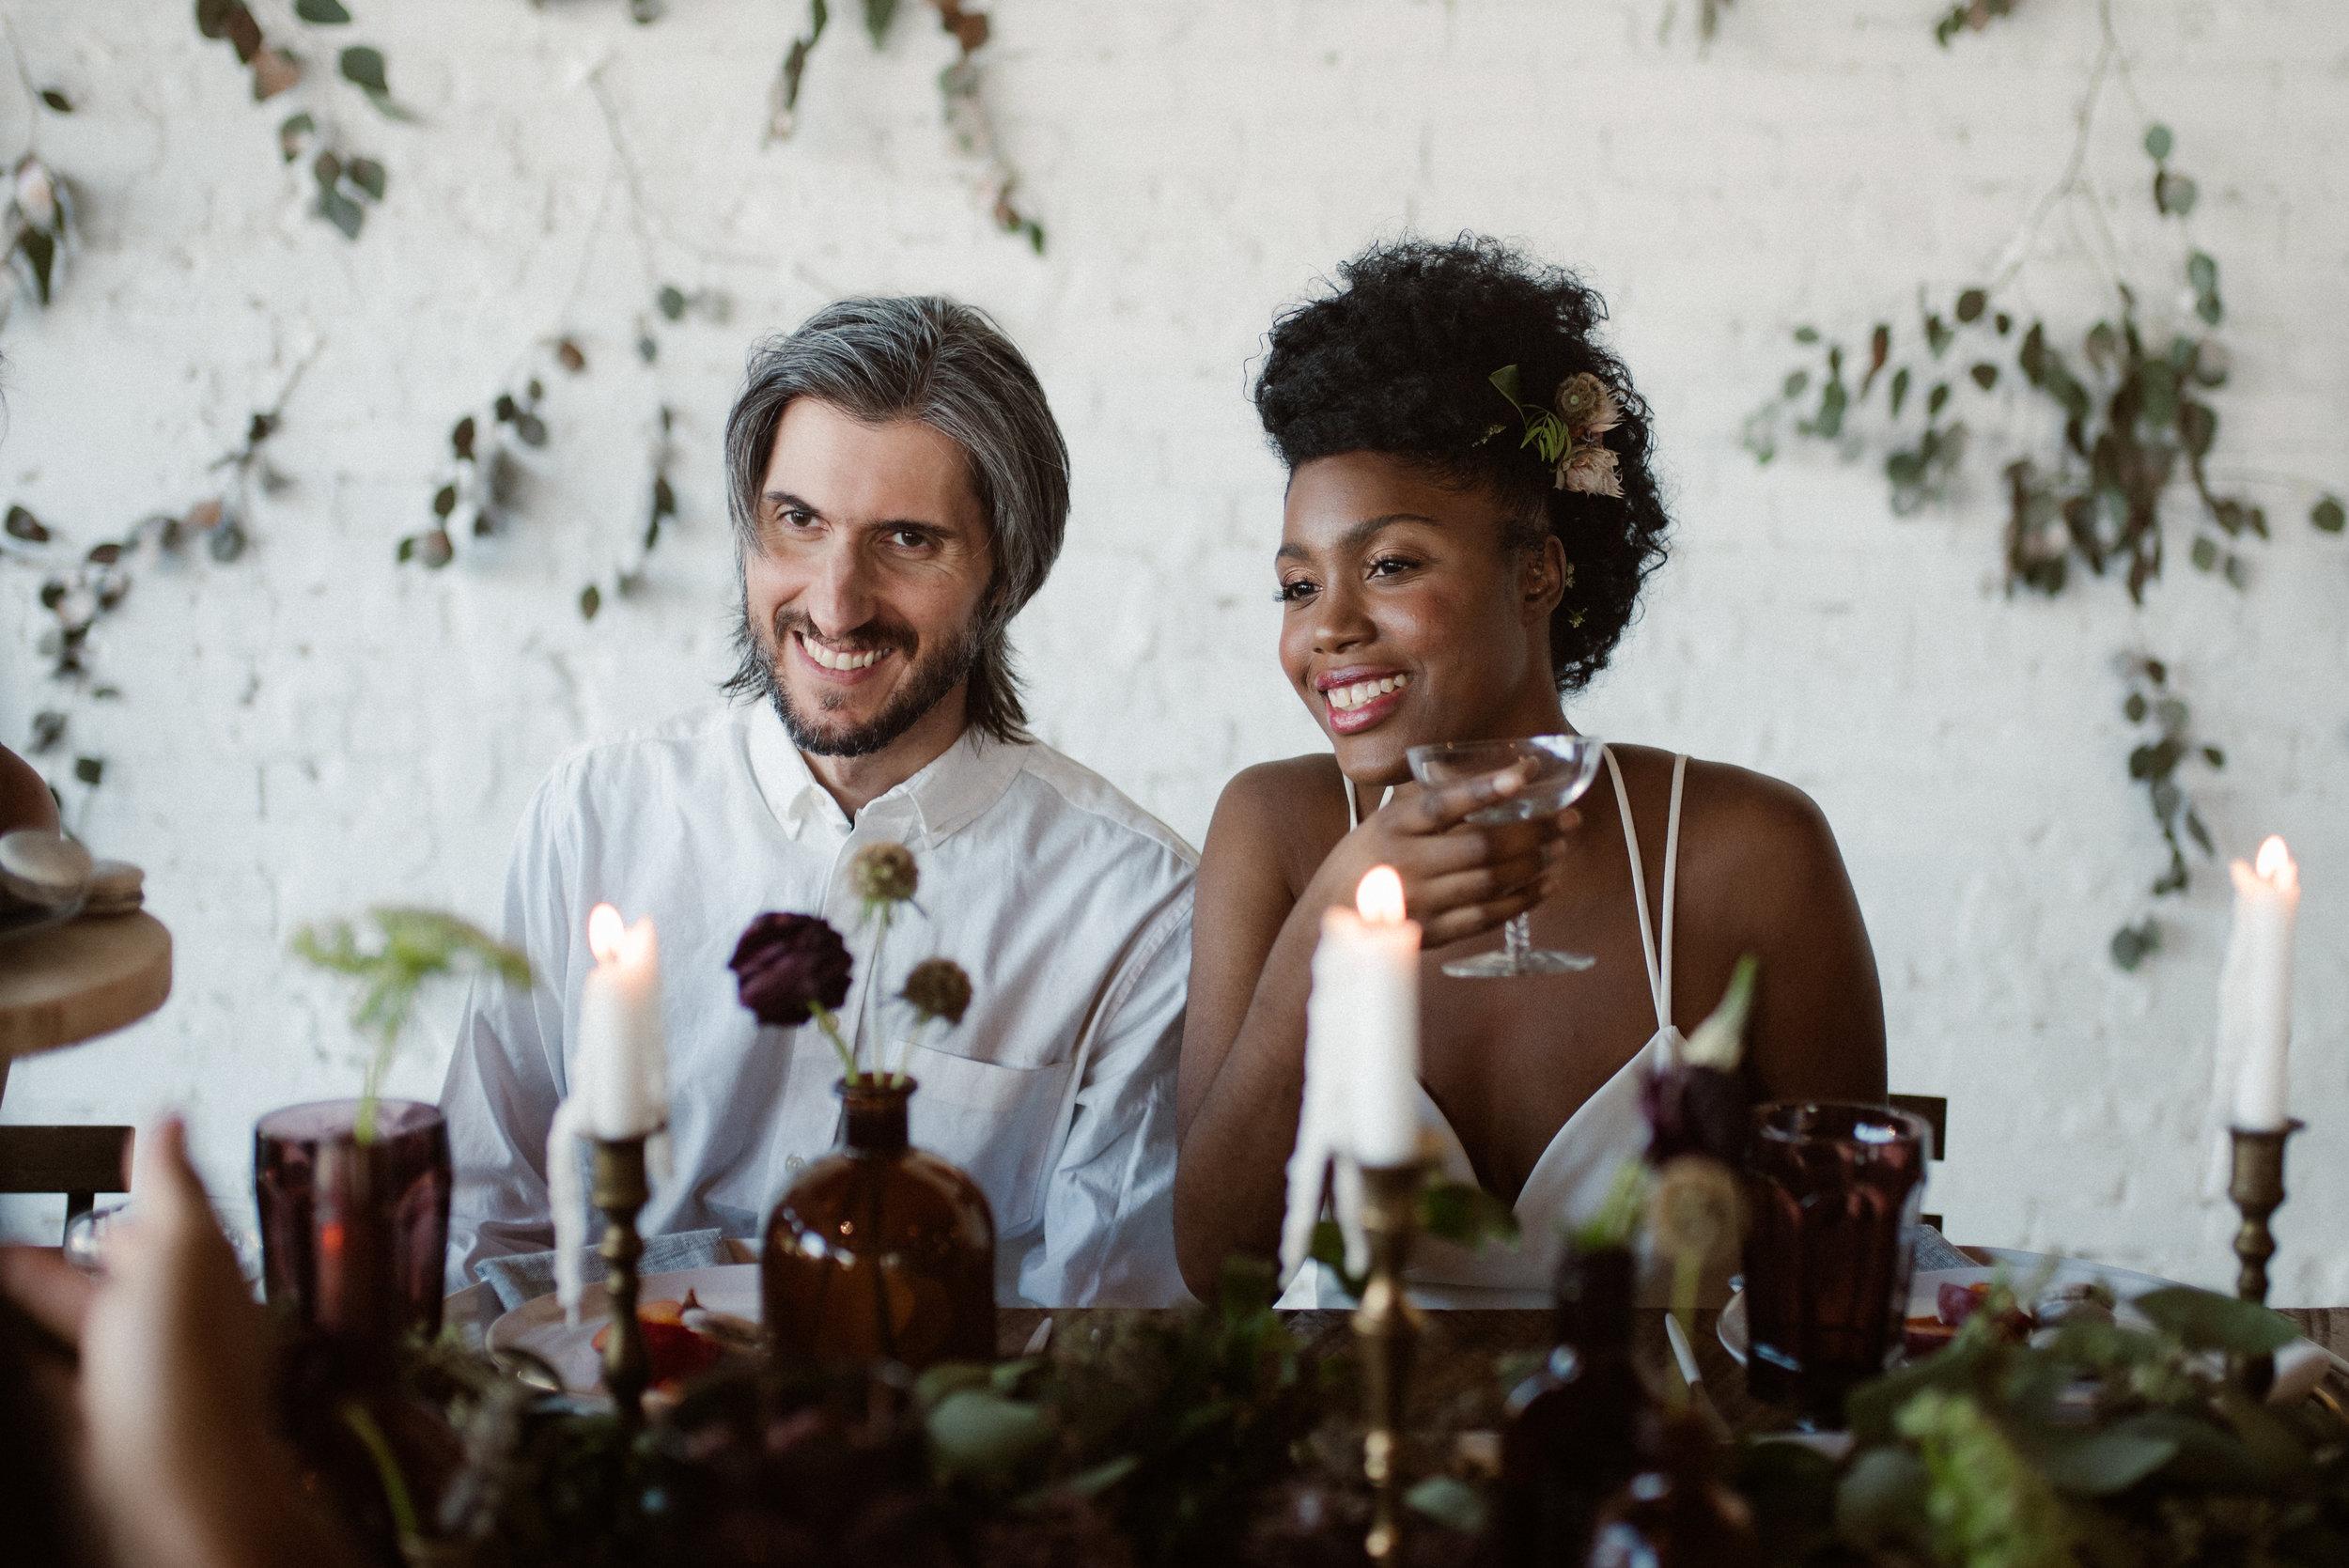 haus-820-minimal-editorial-wedding-styled-shoot-38.jpg